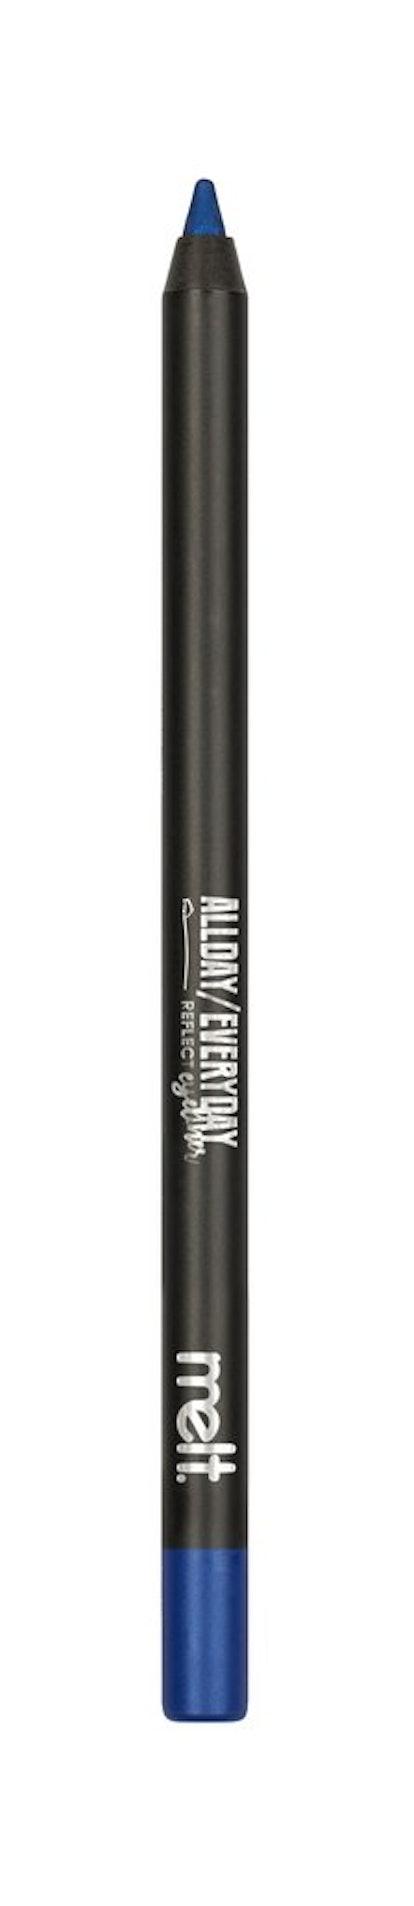 Montauk Eye Pencil